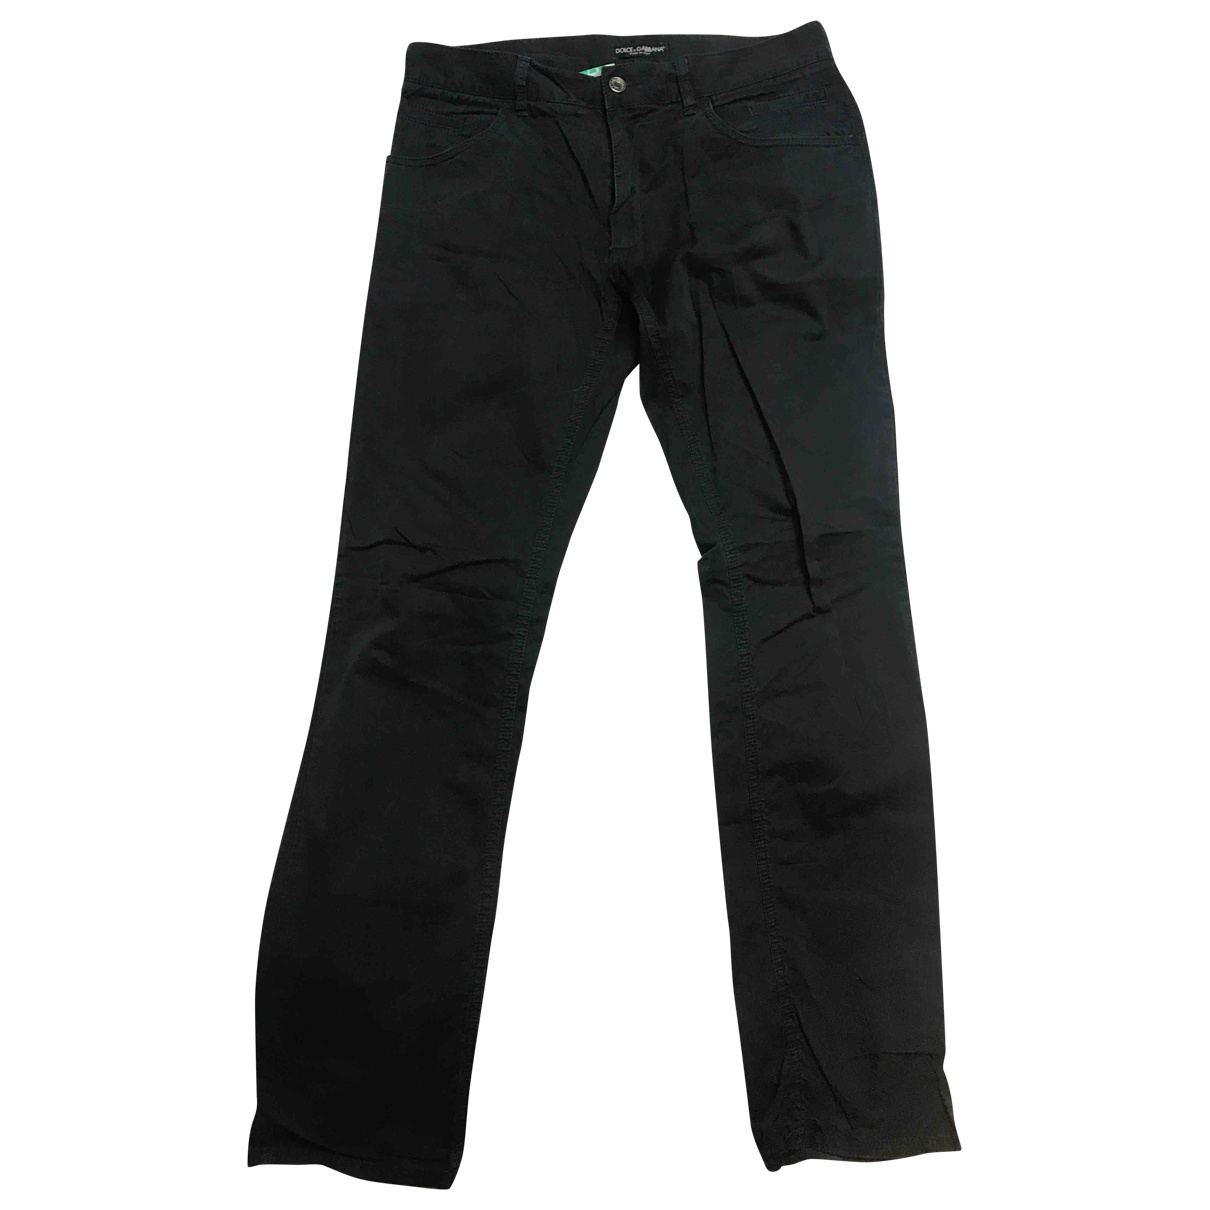 Dolce & Gabbana - Pantalon   pour homme en coton - marine